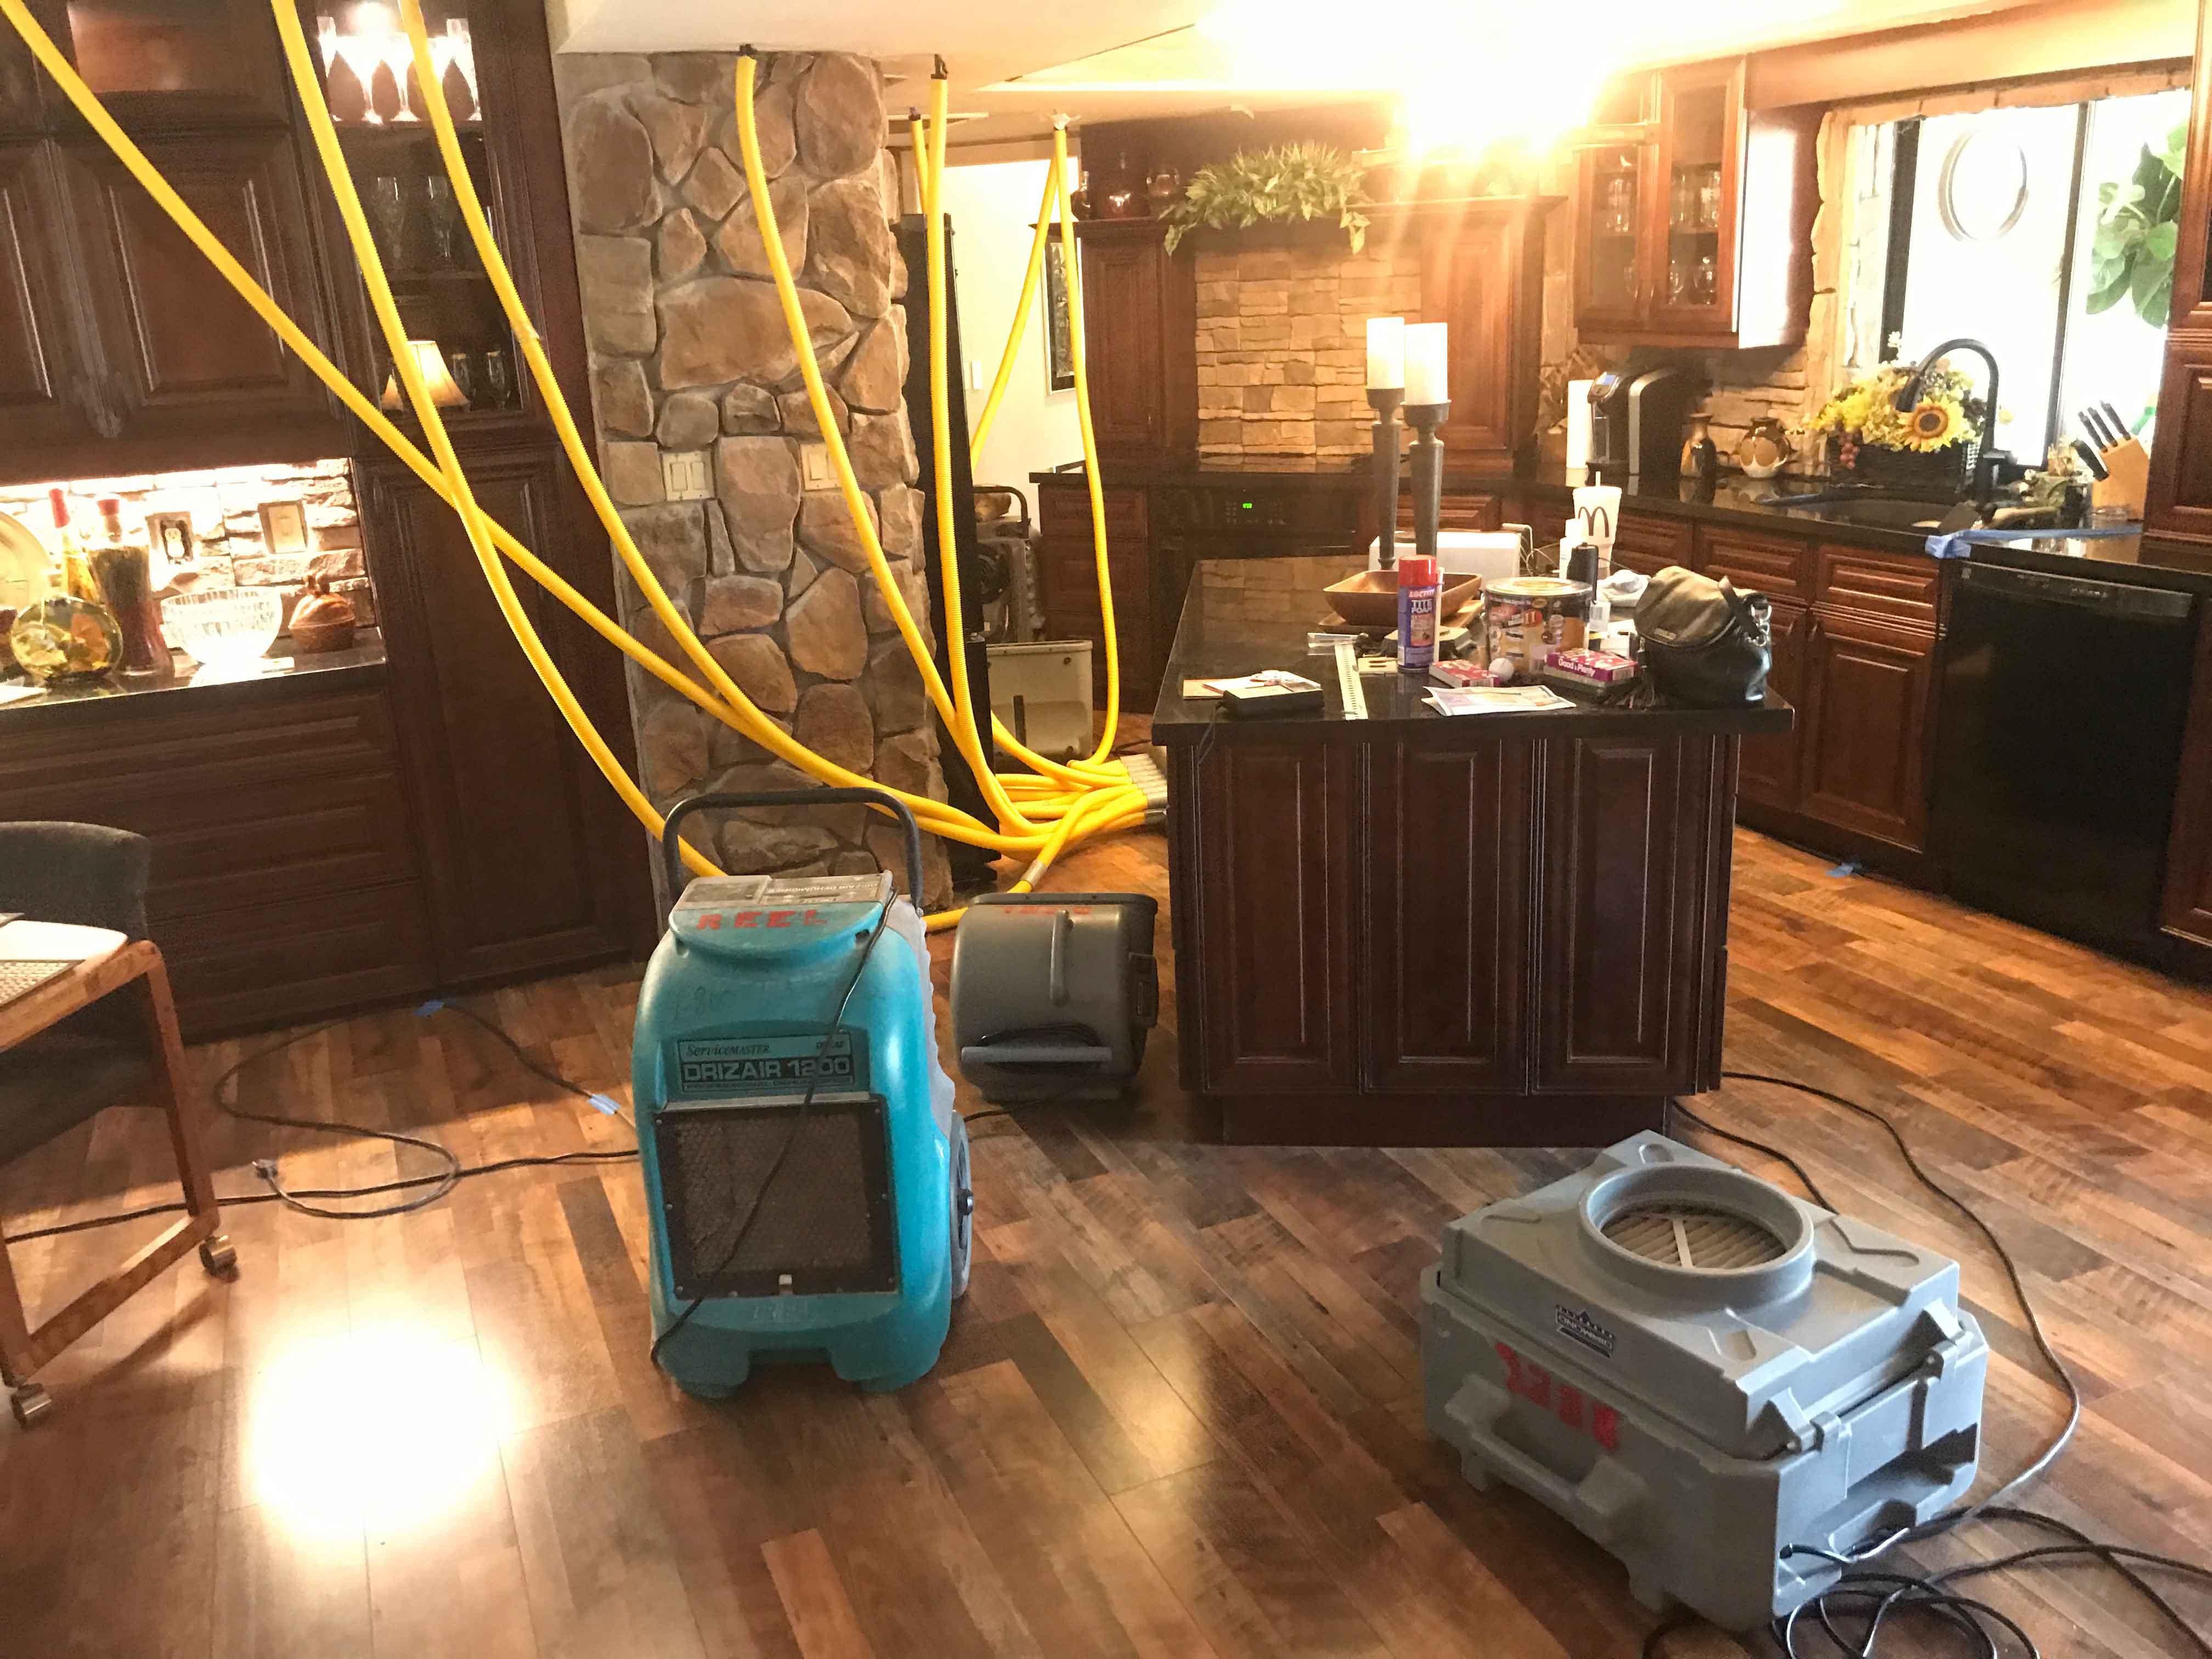 Reel-Contractors-Water-Damage-Machines-Humidity-Ventilation-Pembroke-Pines-Fl-Company